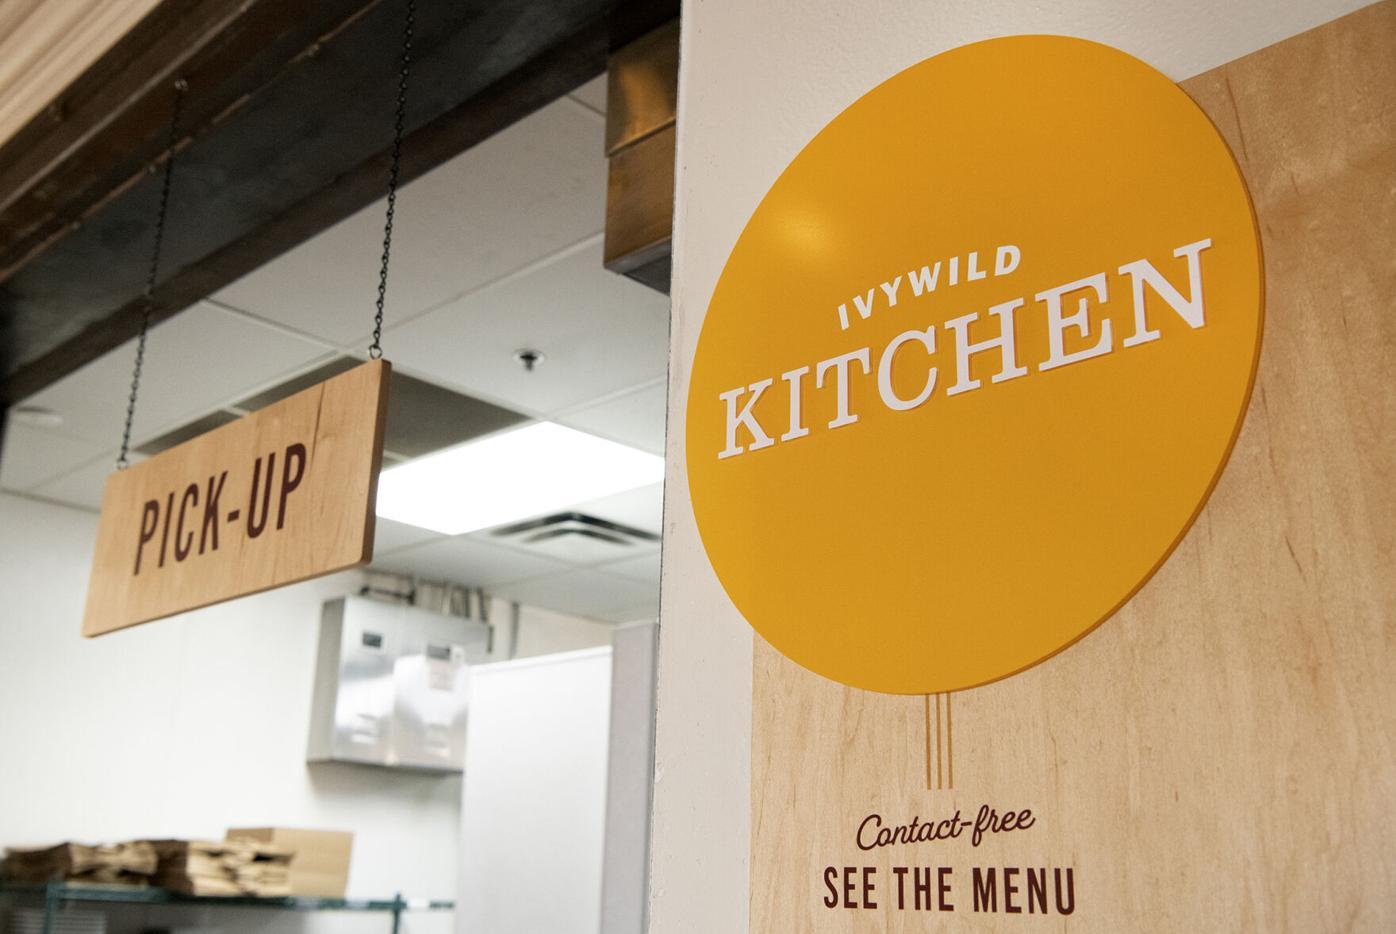 Ivywild Kitchen